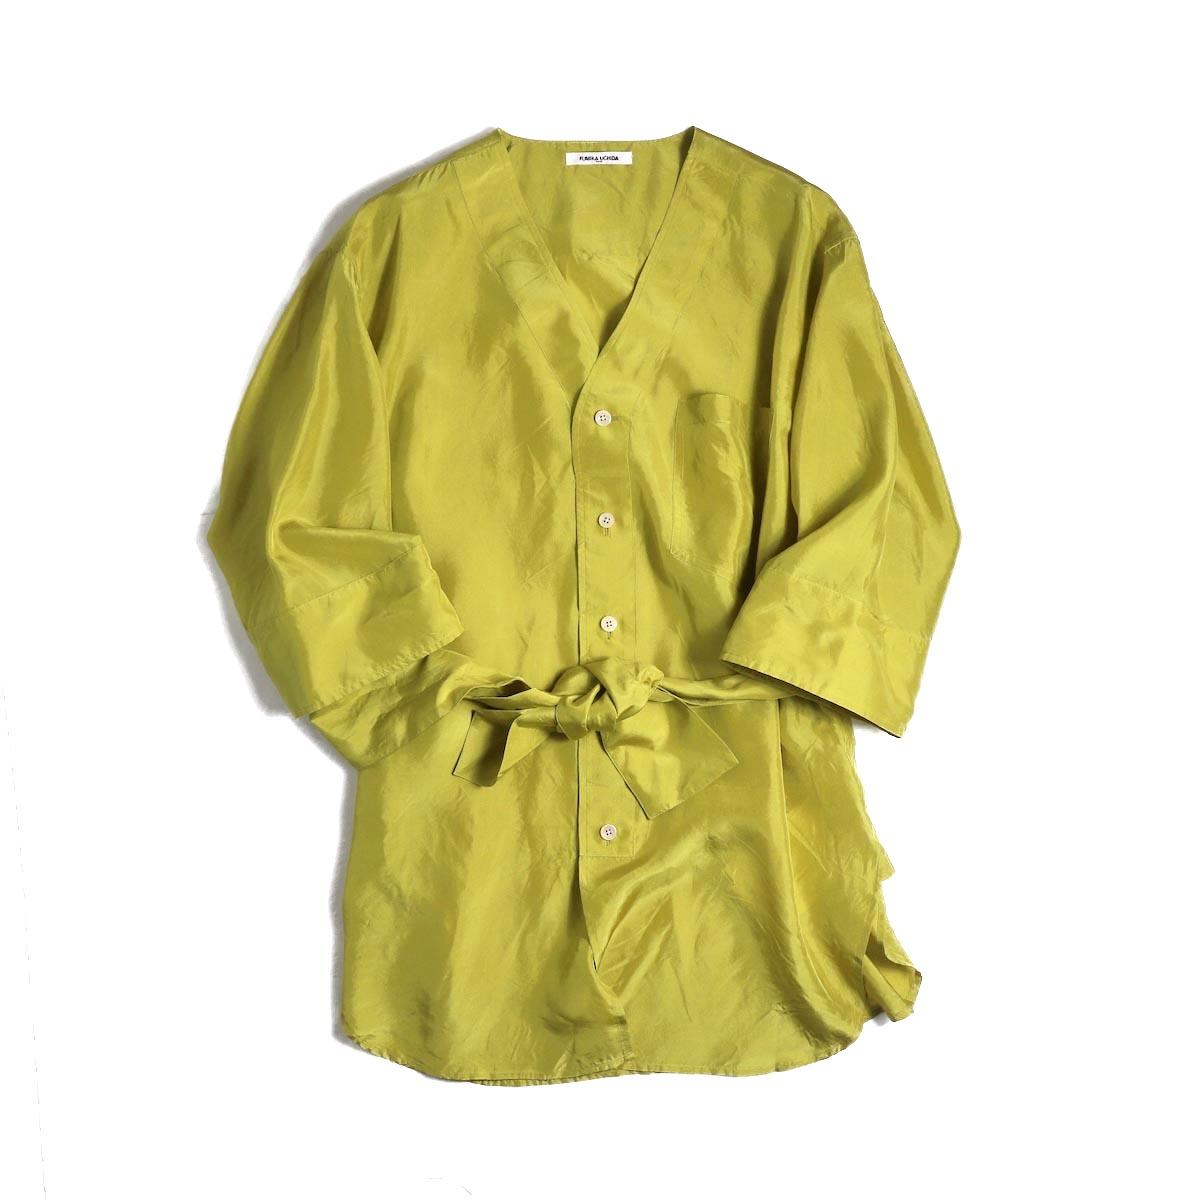 FUMIKA UCHIDA / Silk Sleep Shirt -YELGRN